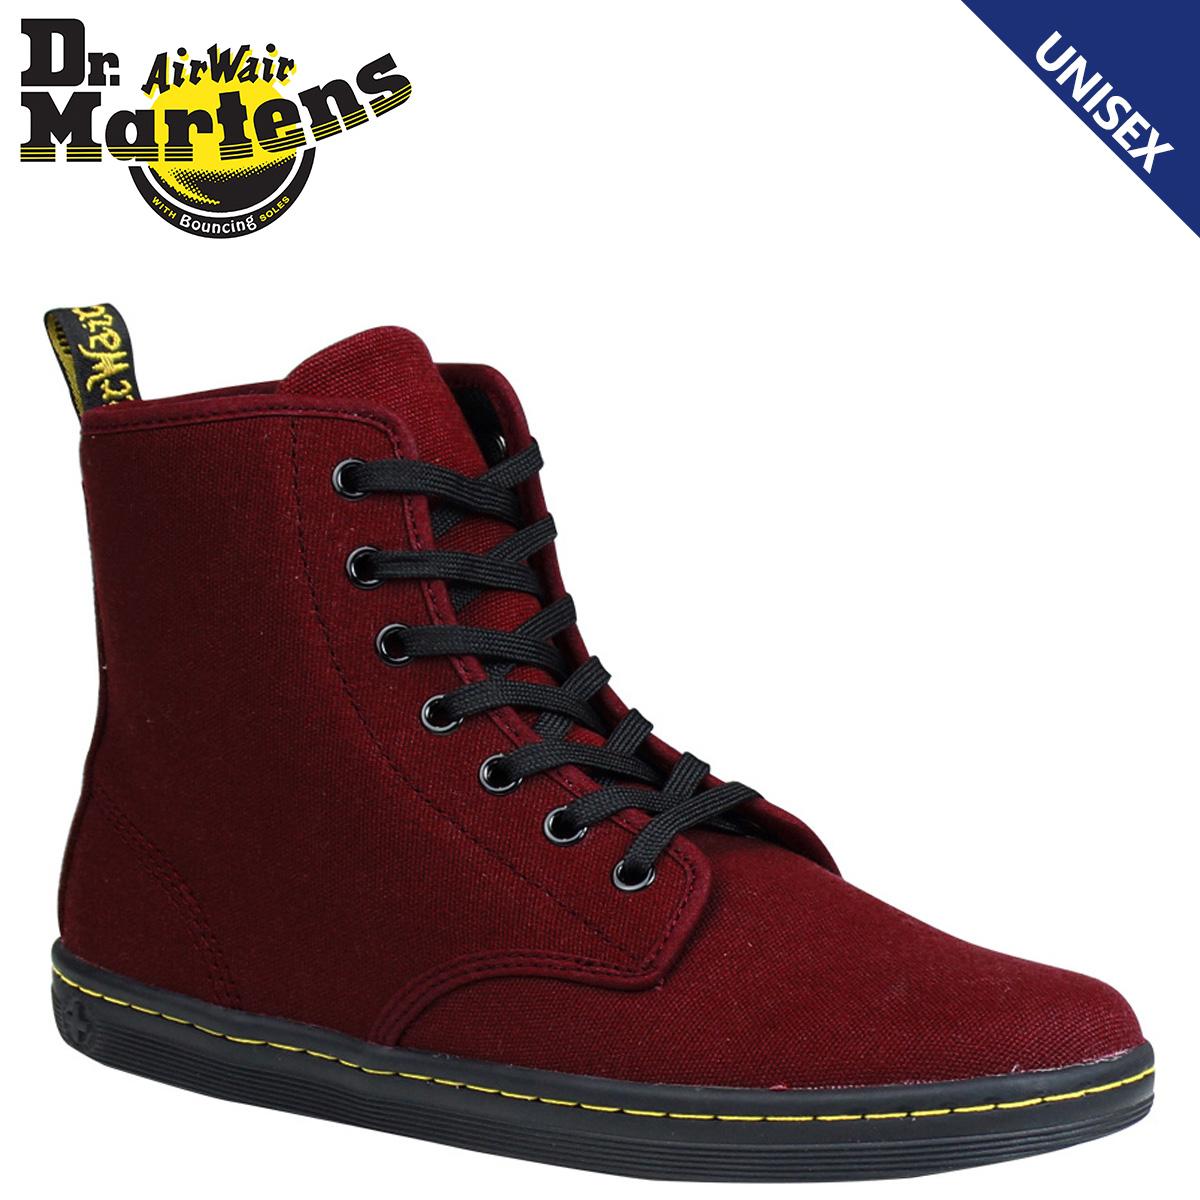 f52b30bdb5ba Point 2 x Dr. Martens Dr.Martens ladies R13524603 7 holes boots  Cherry  Red  SHOREDITCH canvas  1   29 new stock   regular